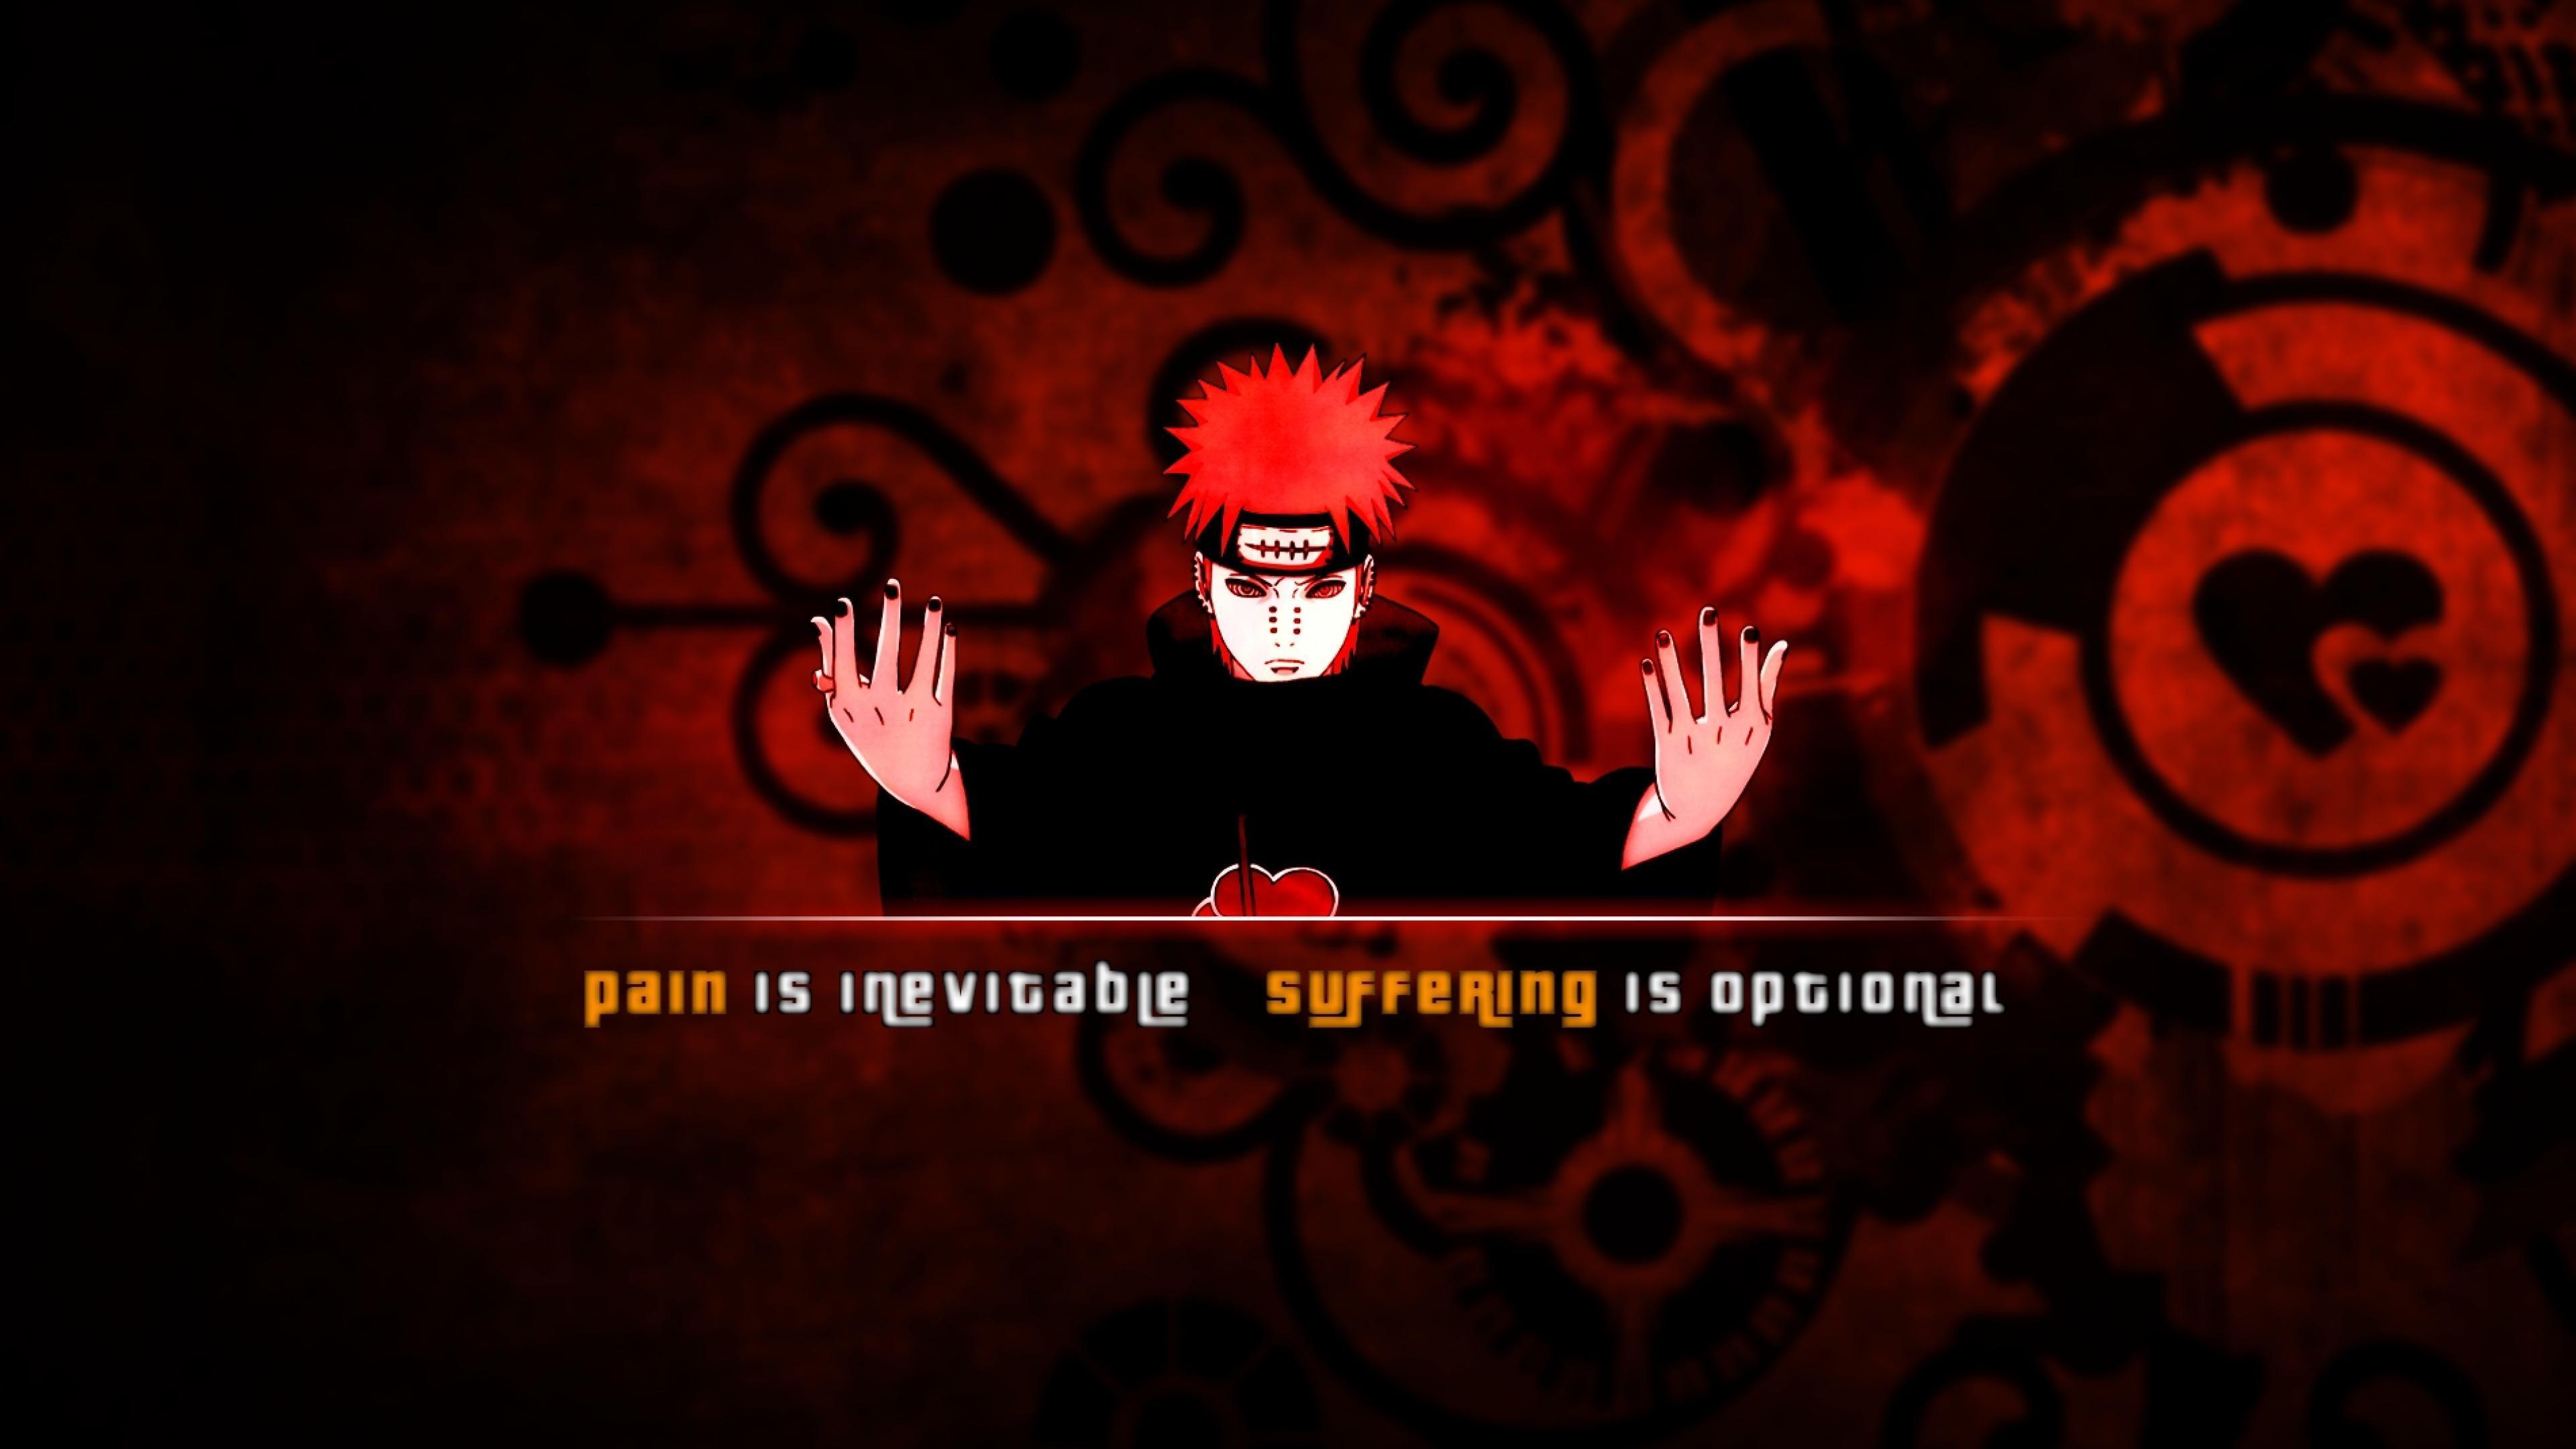 Akatsuki Pain Wallpapers - Wallpaper Cave